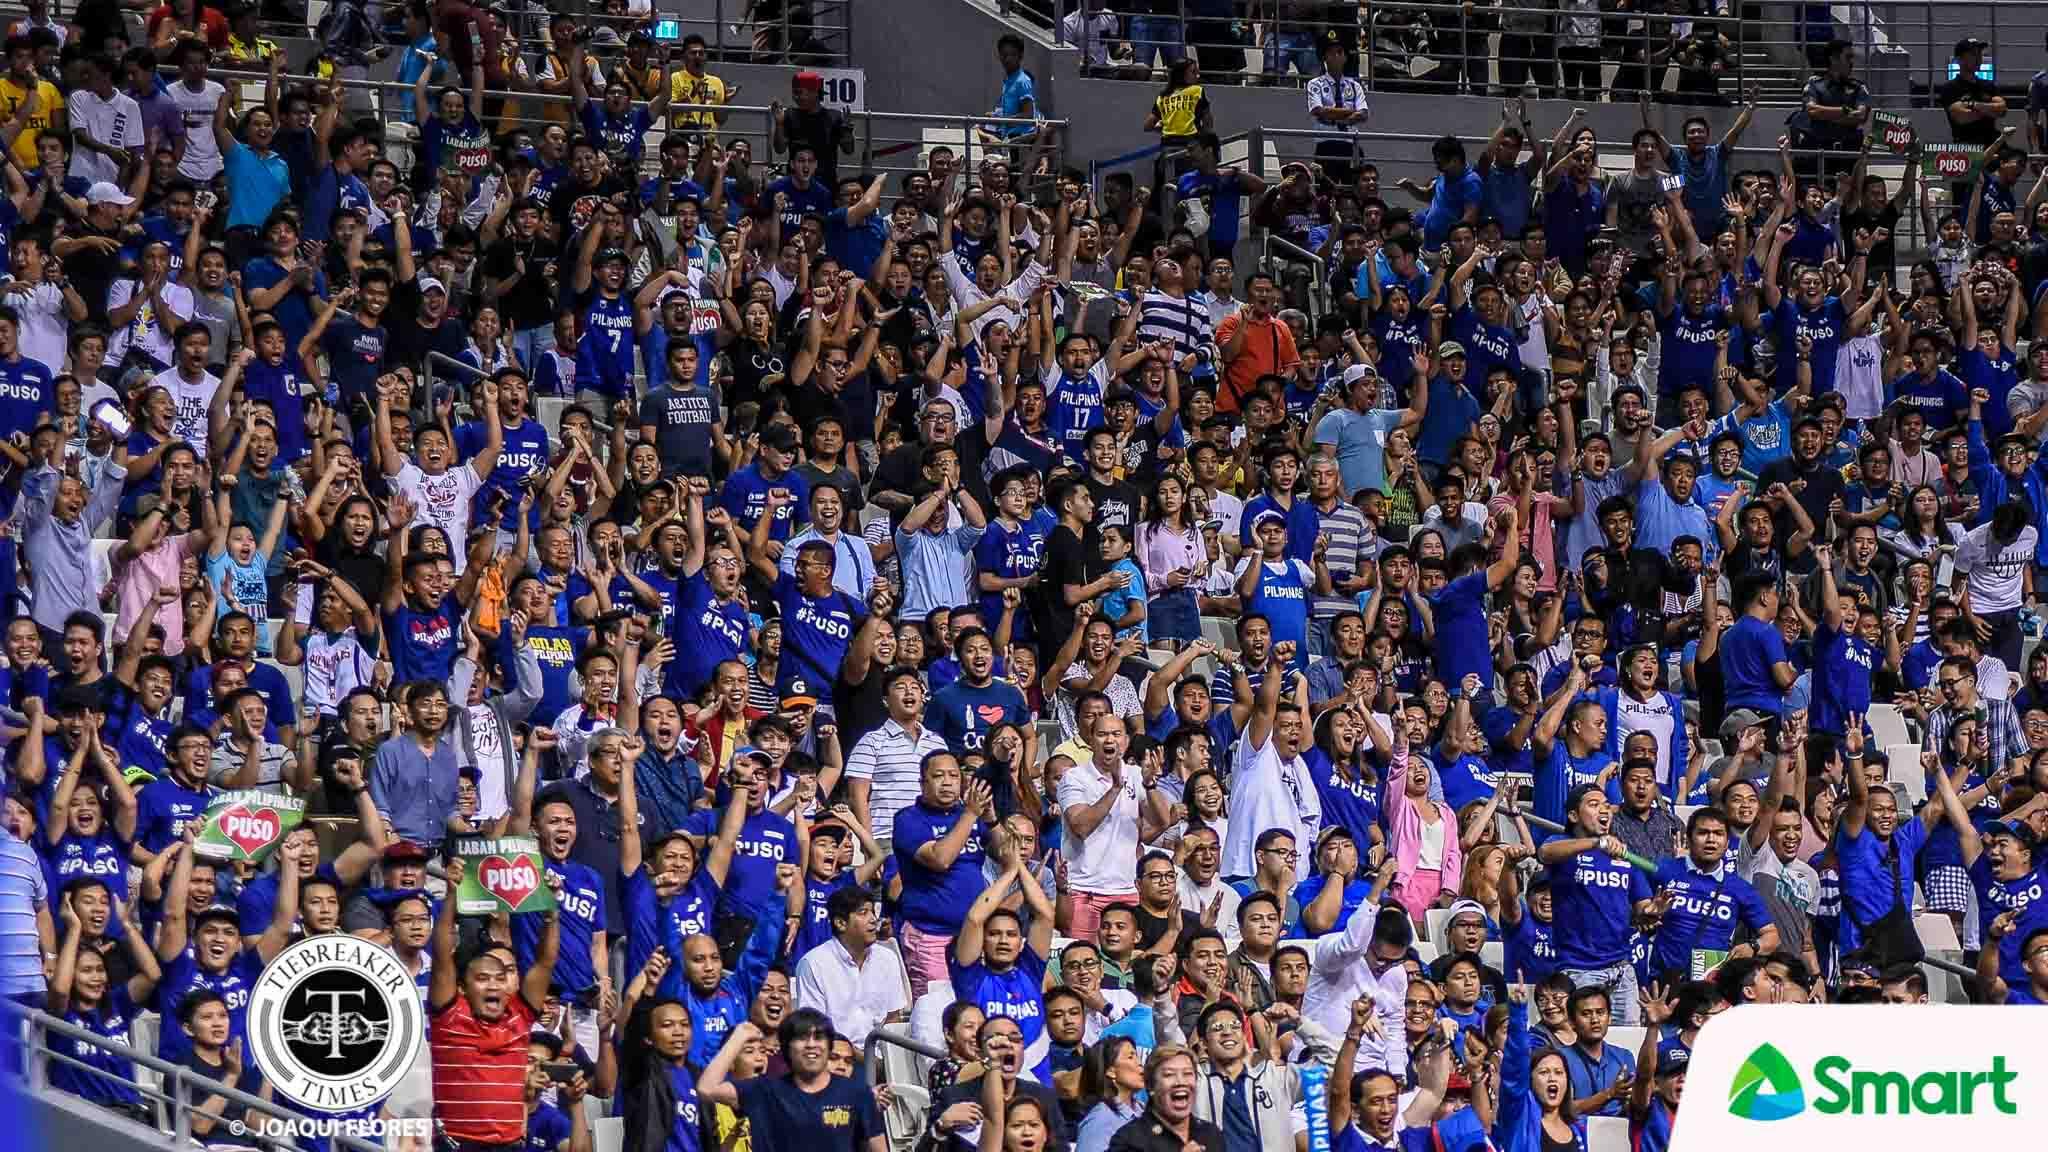 Tiebreaker Times SBP on closed door game: 'It is painful' 2019 FIBA World Cup Qualifiers Basketball Gilas Pilipinas News  Samahang Basketbol ng Pilipinas 2019 FIBA World Cup Qualifiers